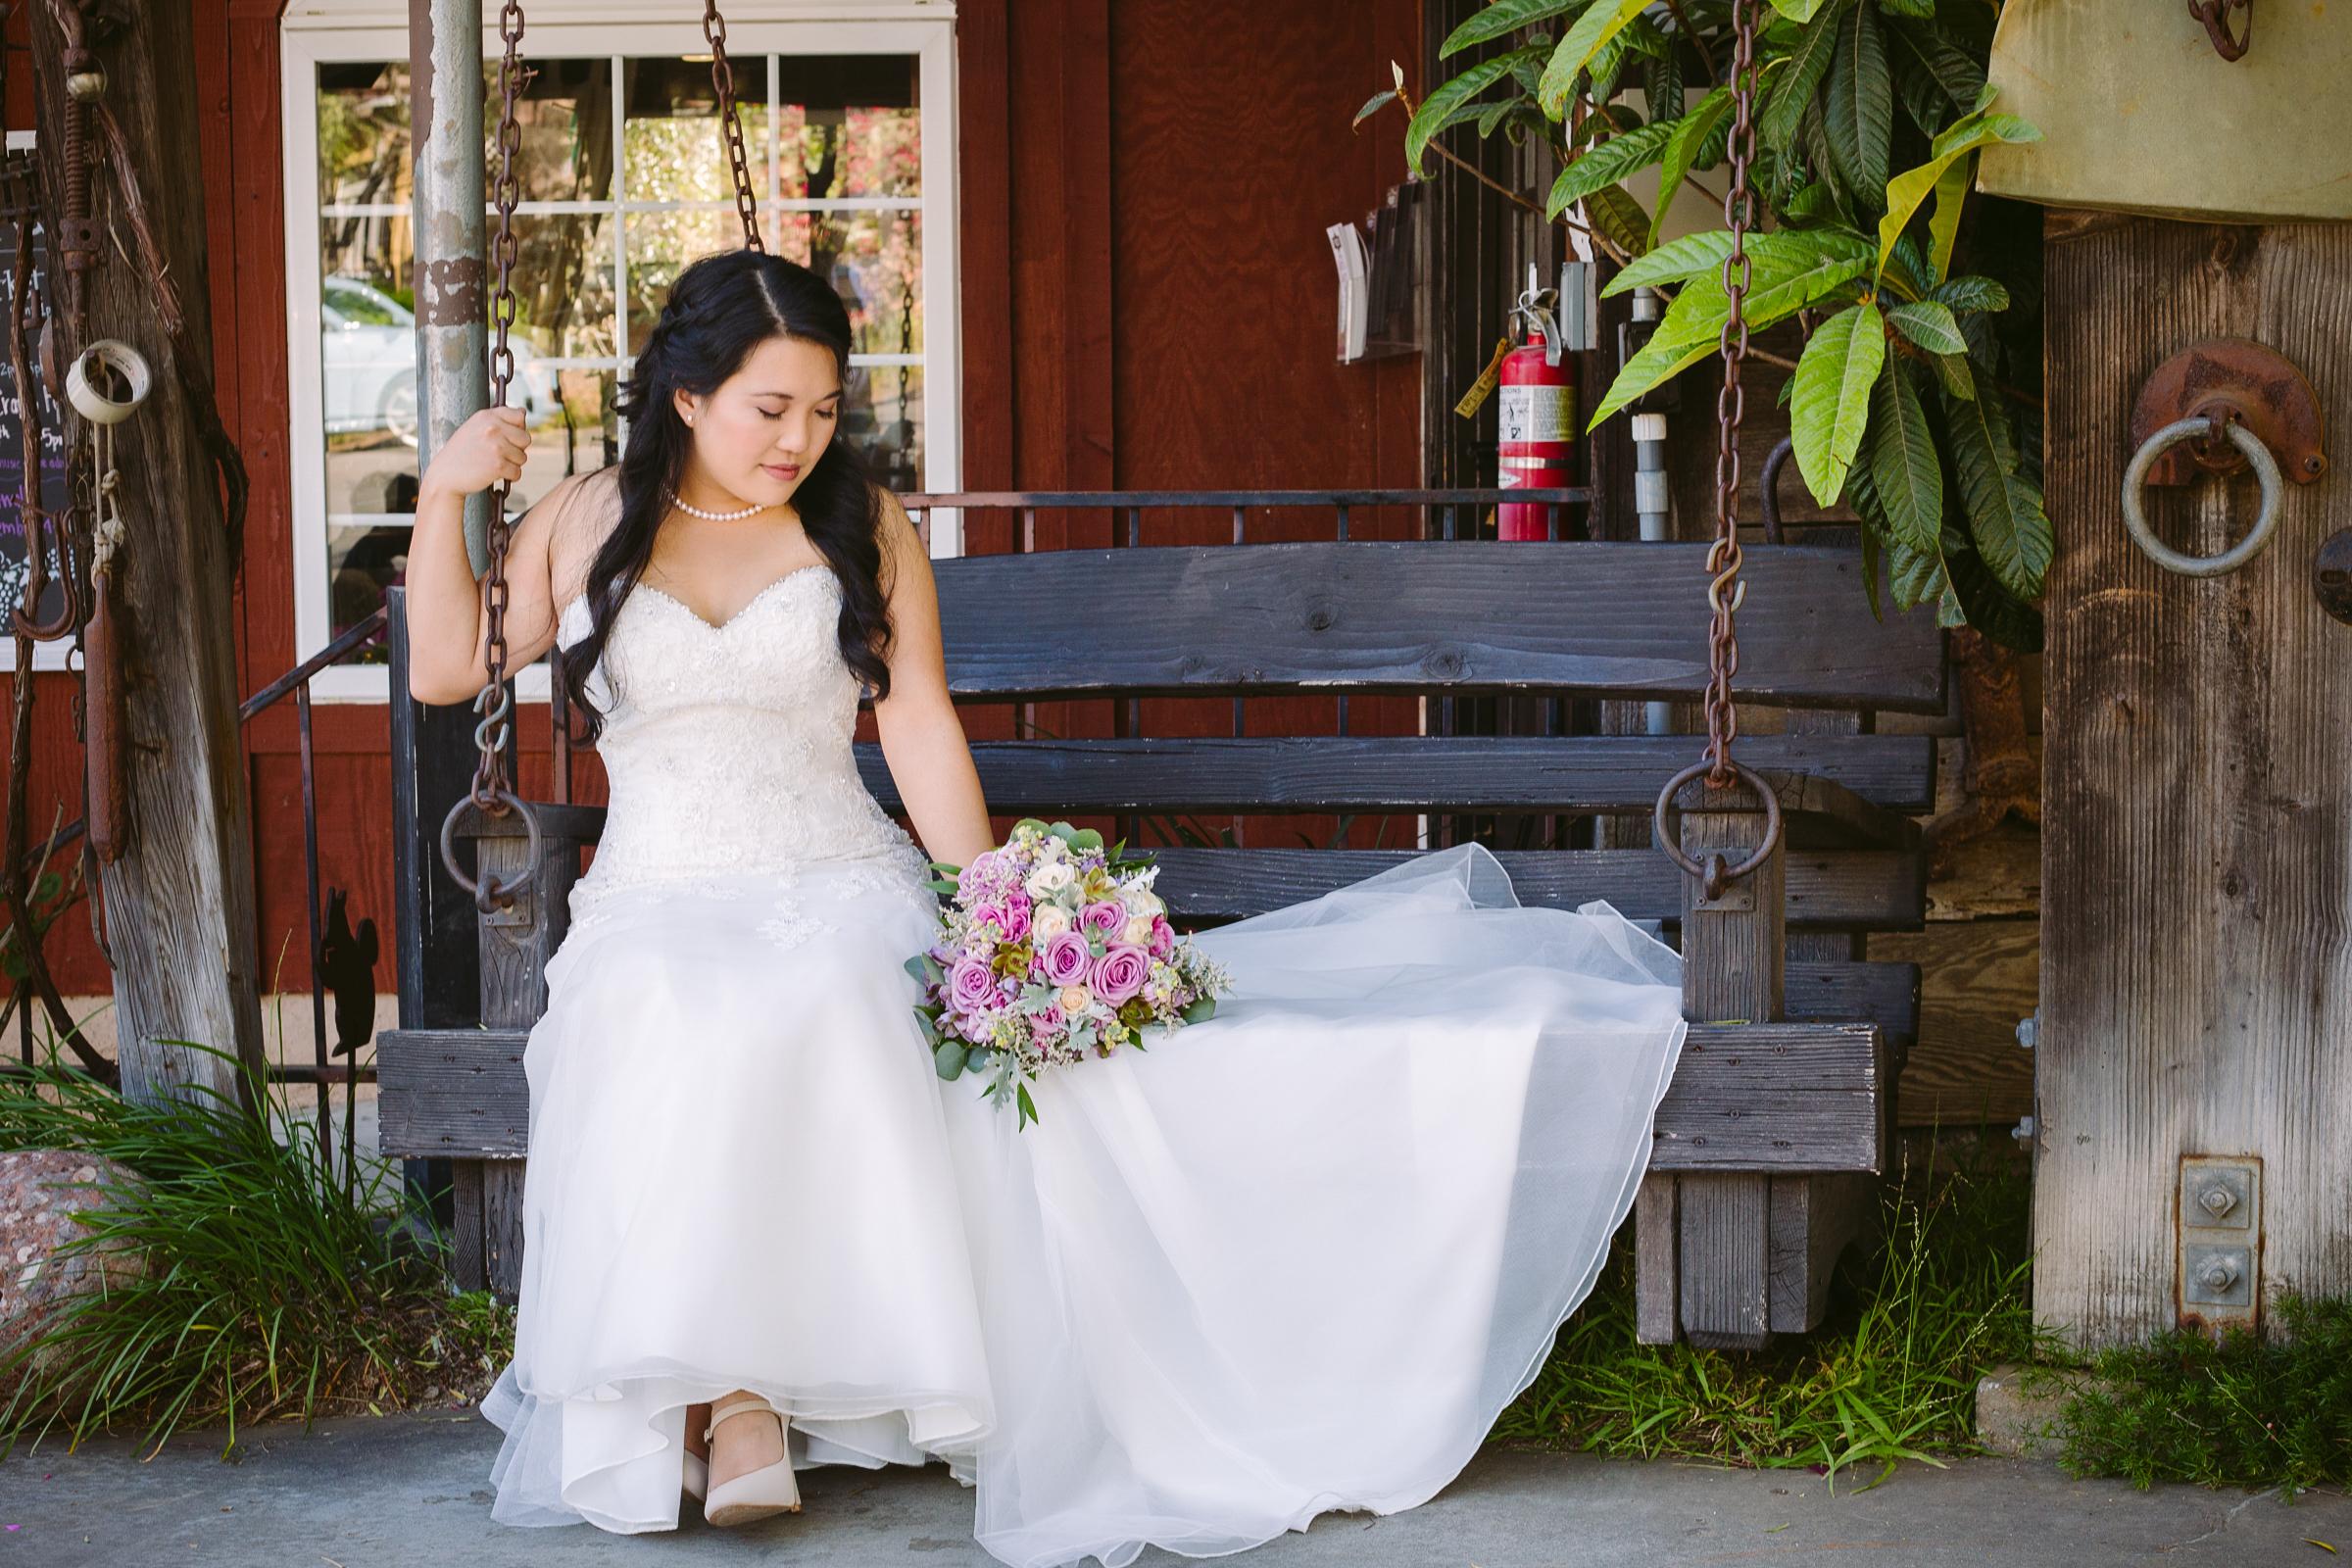 San Diego Wedding and Destination Wedding Photography Blessed Weddings 113.jpg